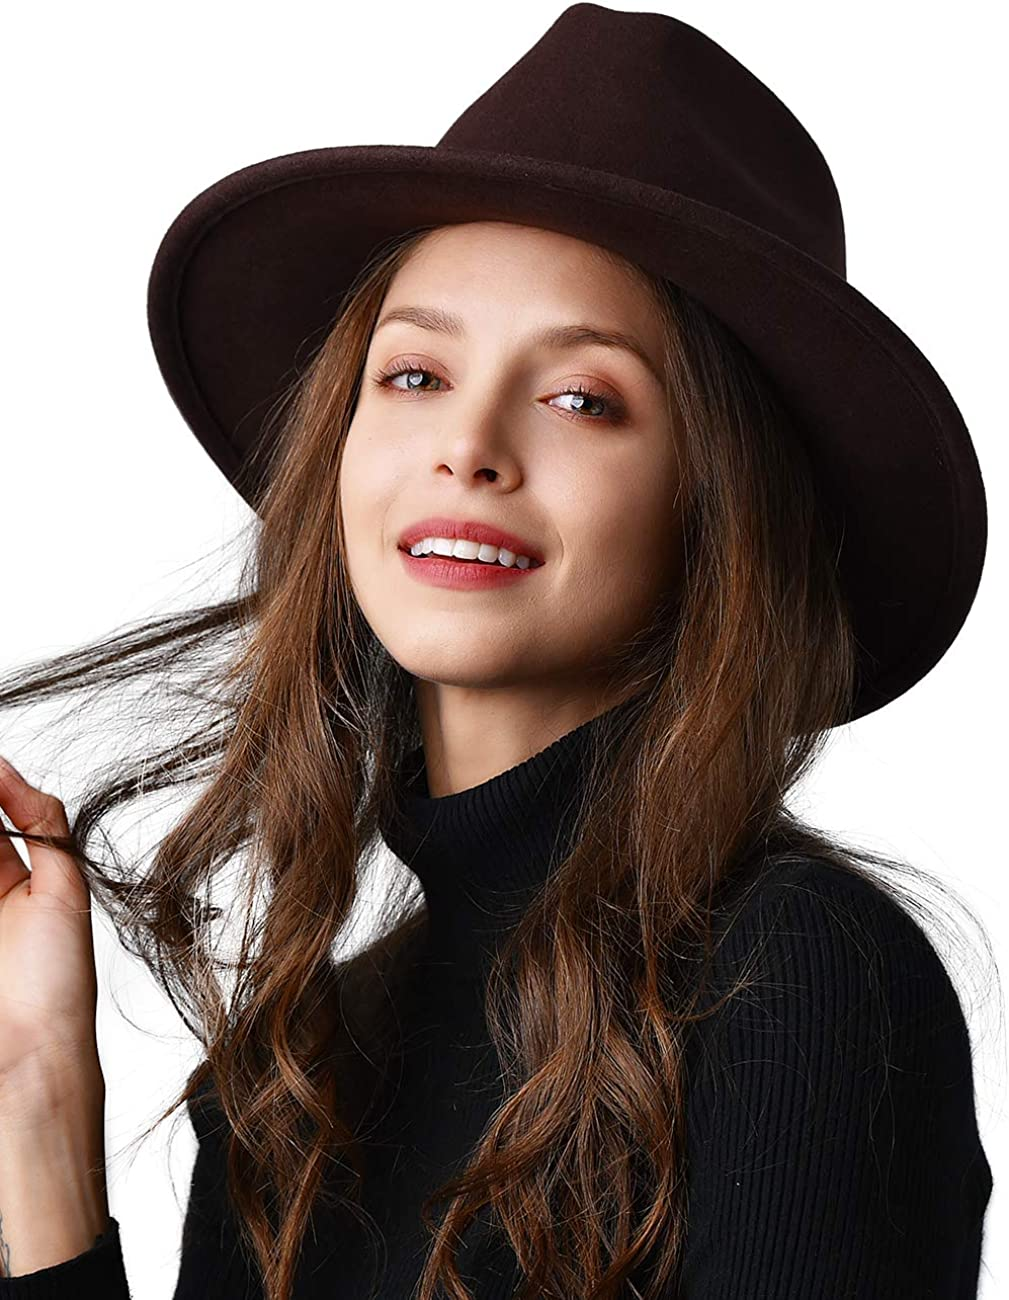 FURTALK 100% Wool Wide Brim Fedora Panama Hat with Belt Buckle Fedora Hats  for Men Women at Amazon Women's Clothing store